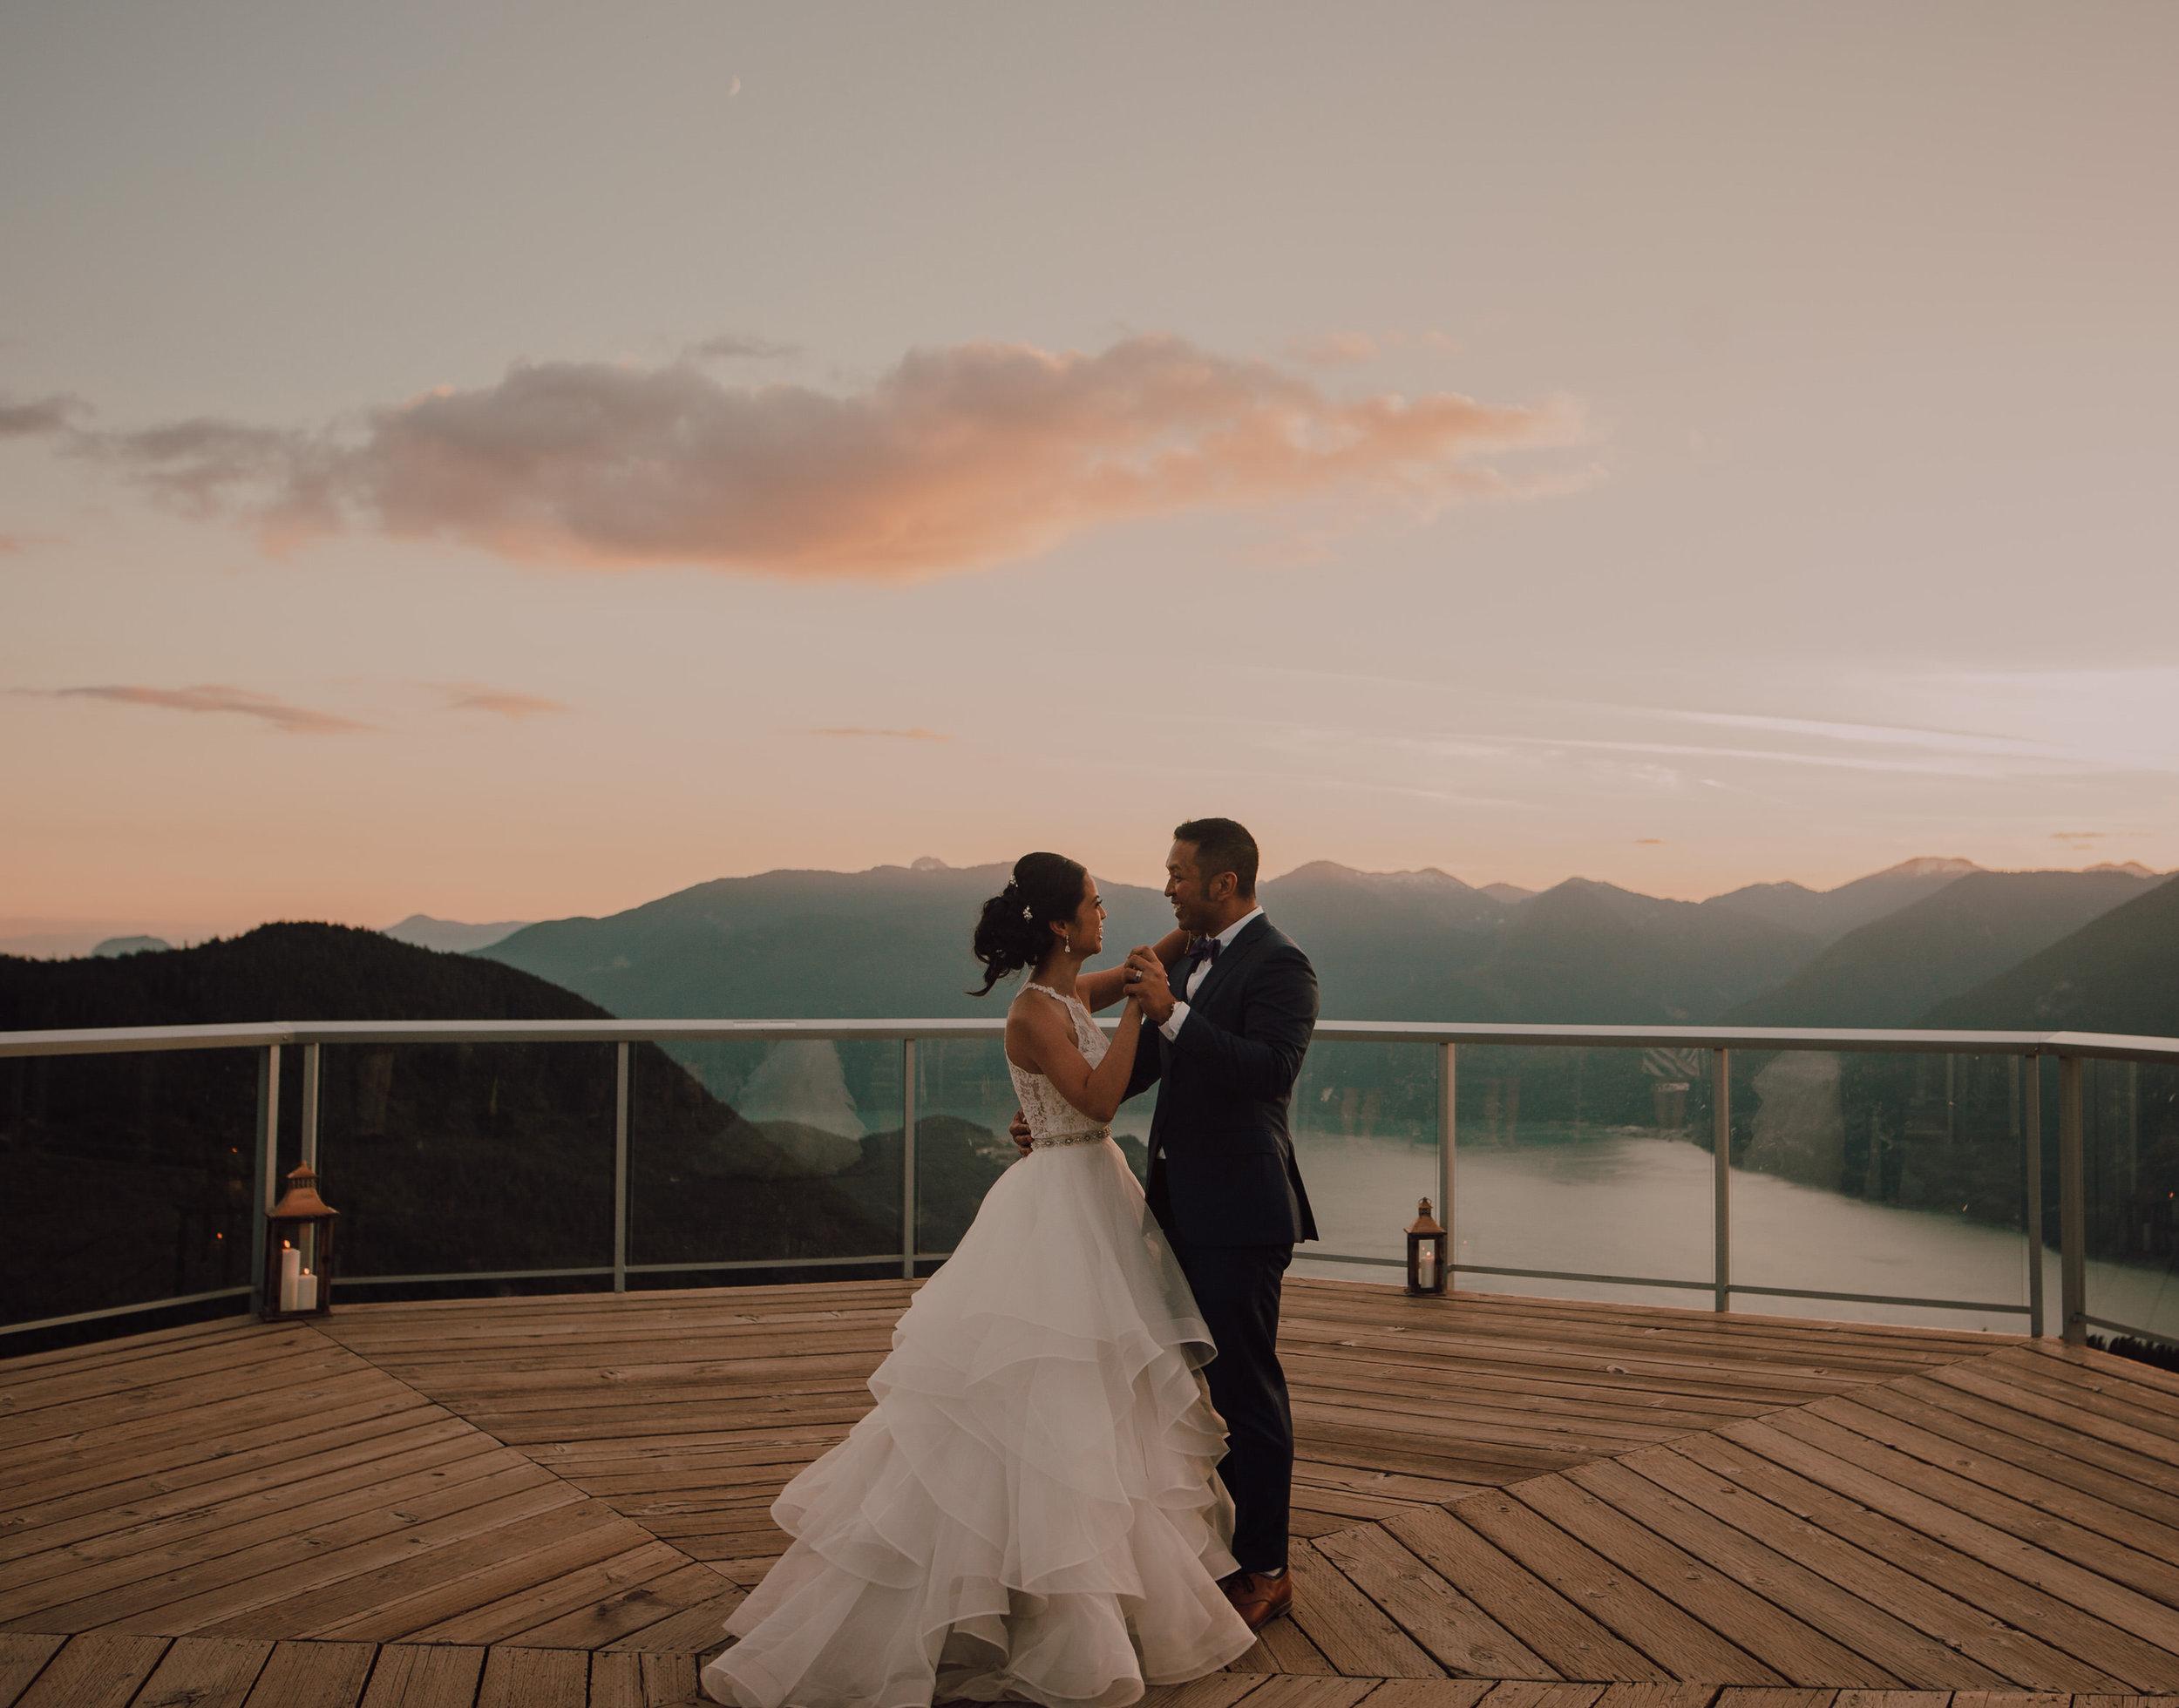 Squamish Wedding Photographer - Sea to Sky Gondola Wedding Photos -  Vancouver Wedding Photographer & Videographer - Sunshine Coast Wedding Photos - Sunshine Coast Wedding Photographer - Jennifer Picard Photography - IMG_5554.jpg